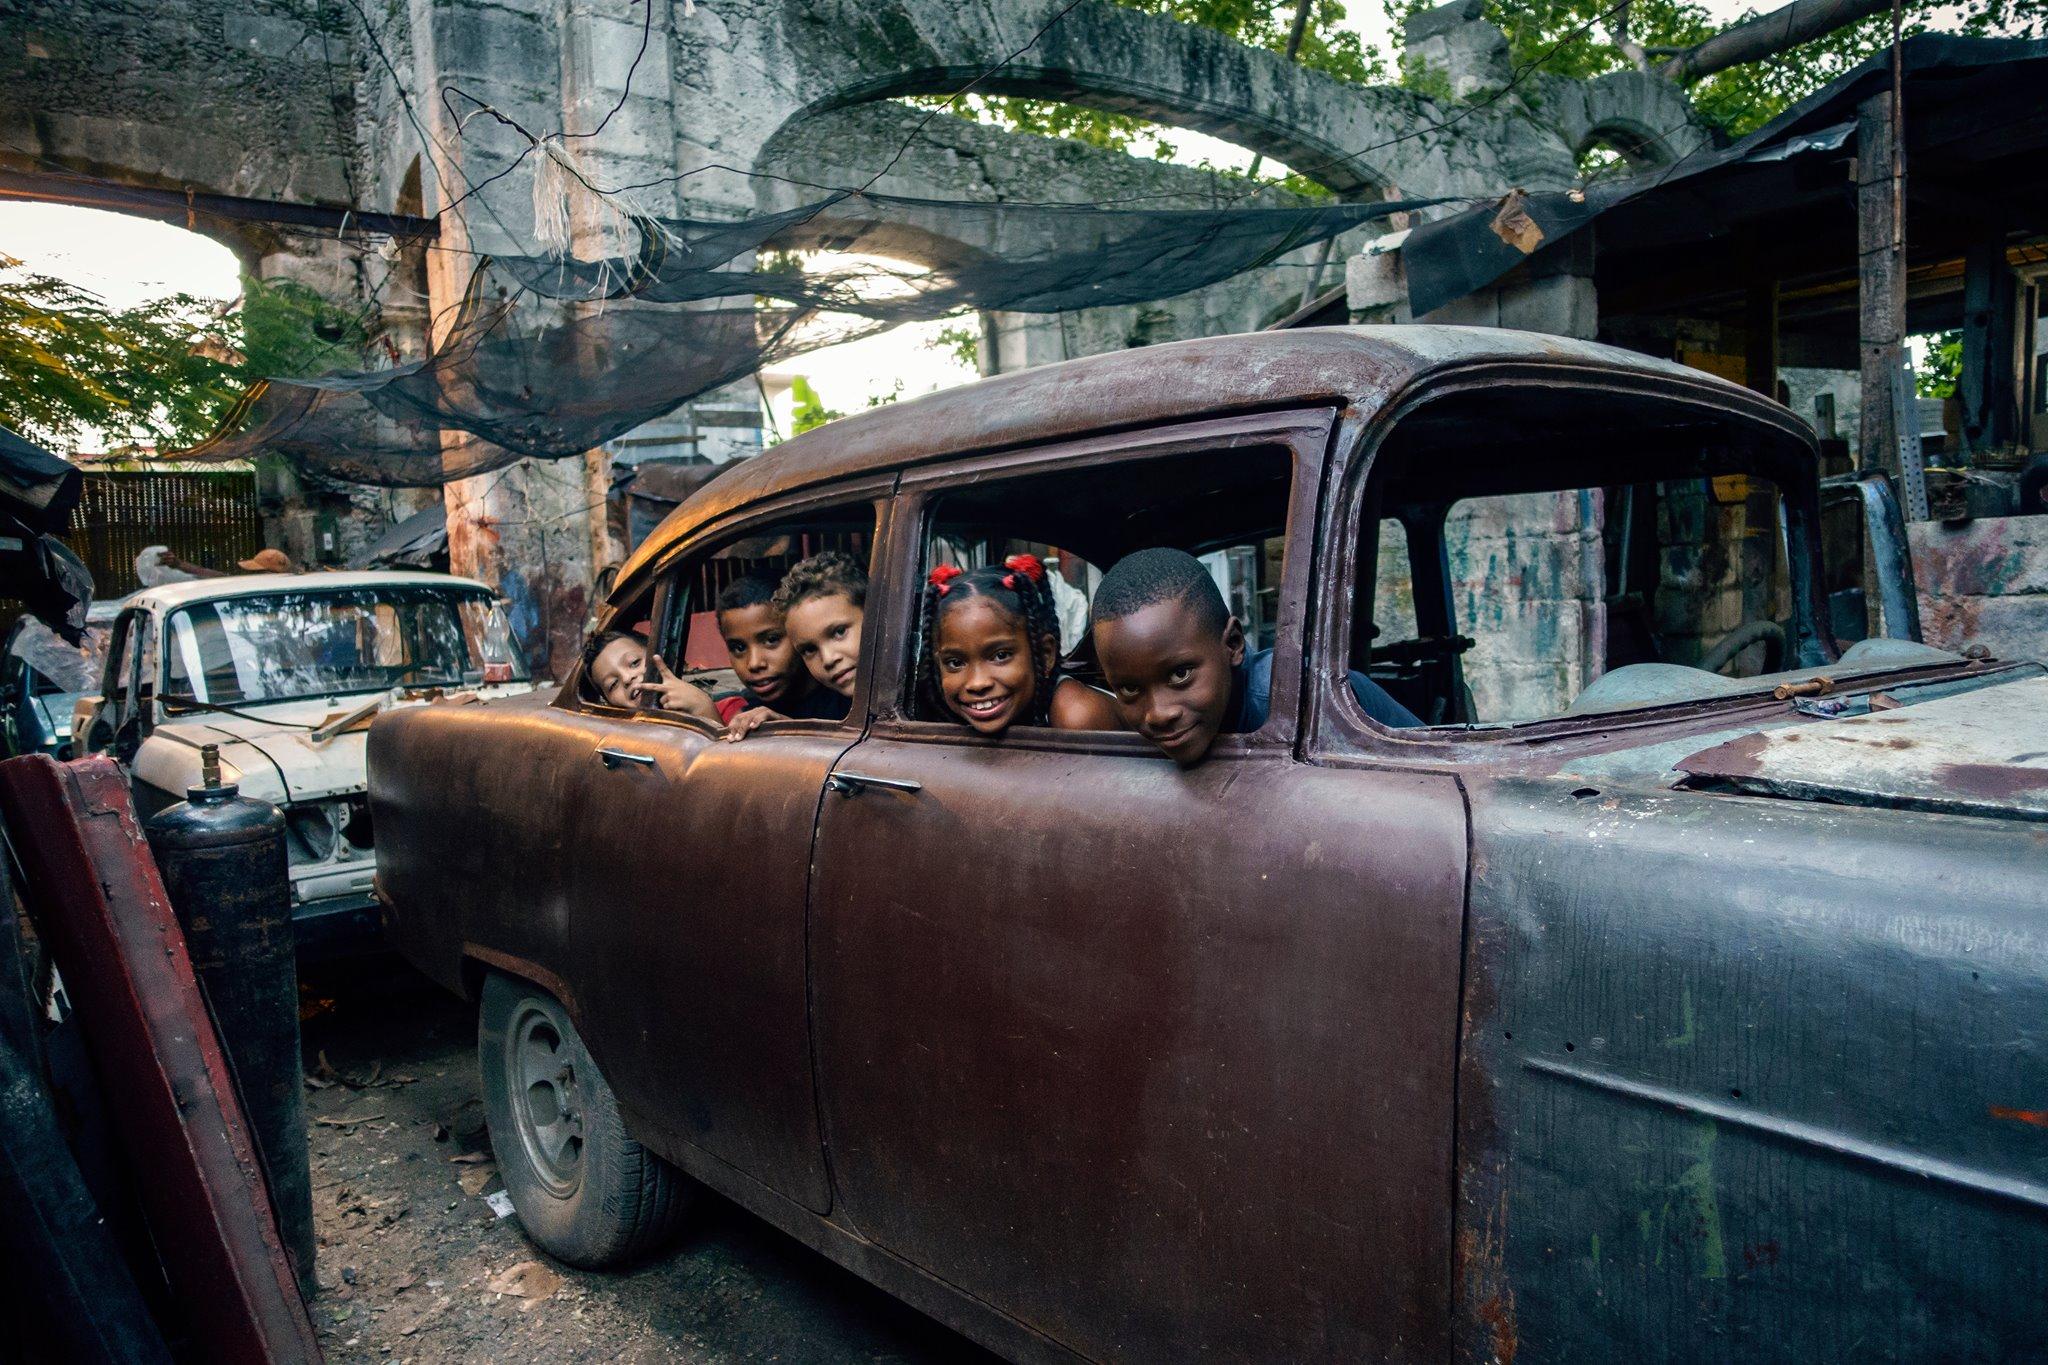 Vernissage okk raum 29 Puertas Abiertas Offene Türen Kuba im Wandel.jpg